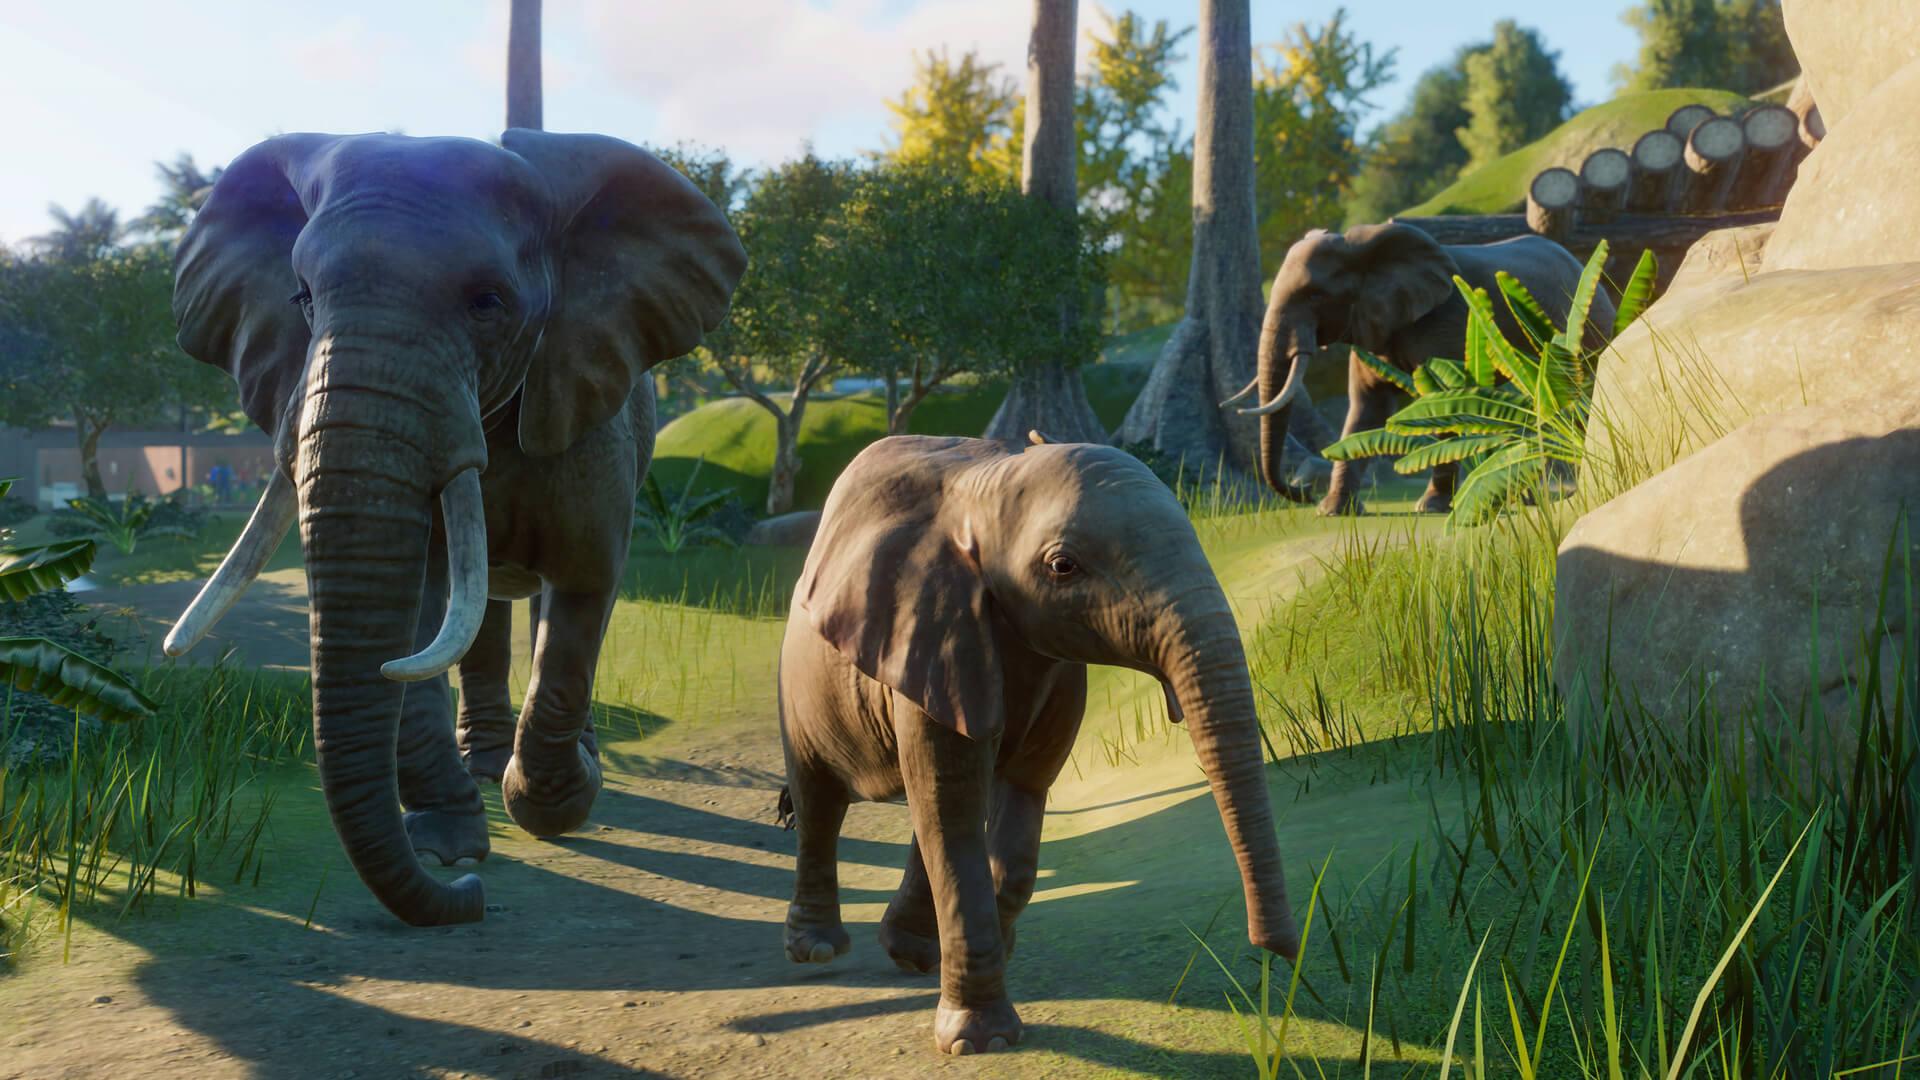 planet zoo elephants wallpaper 68848